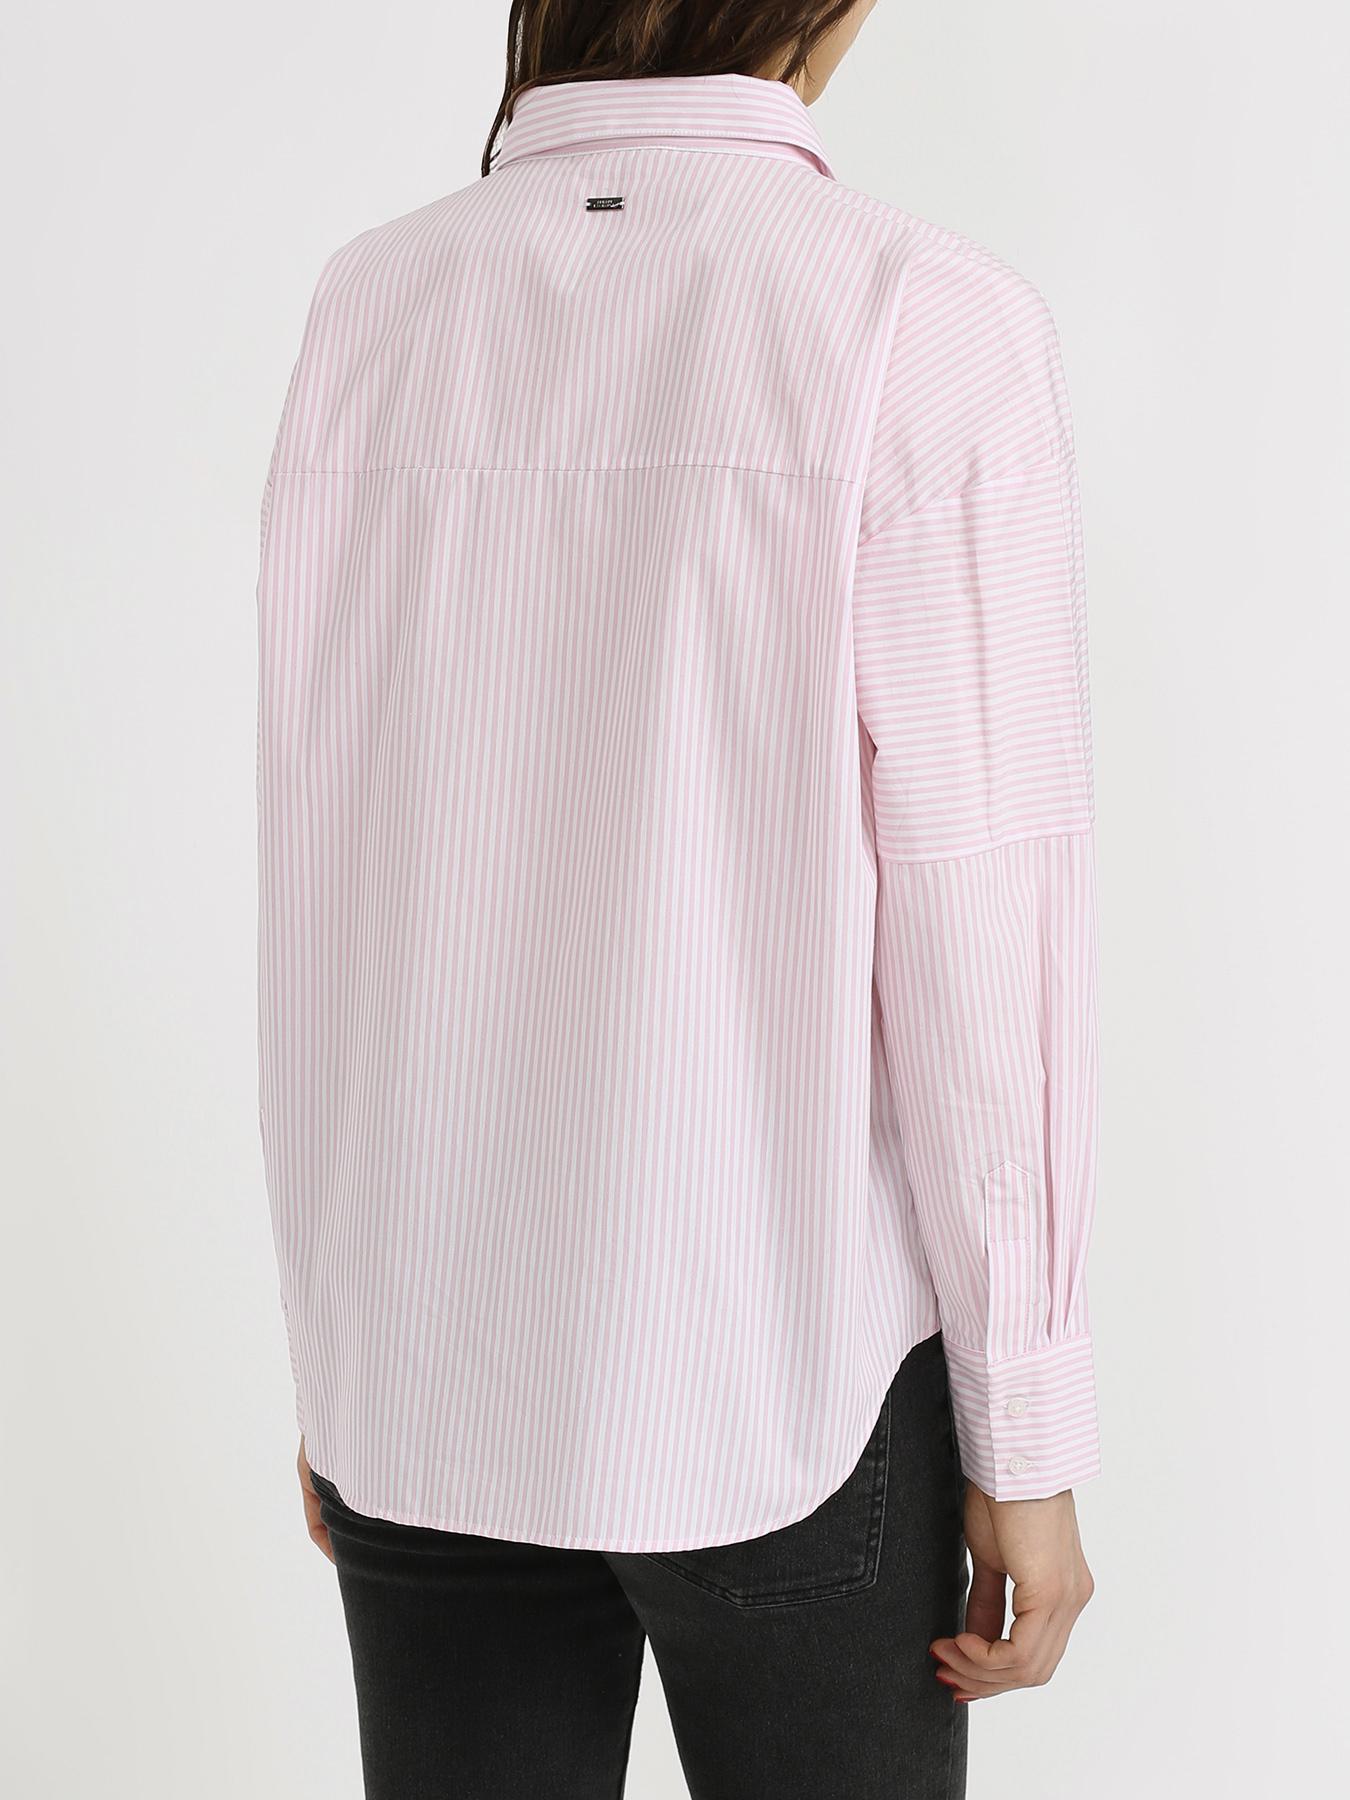 Armani Exchange Полосатая рубашка 342005-044 Фото 2